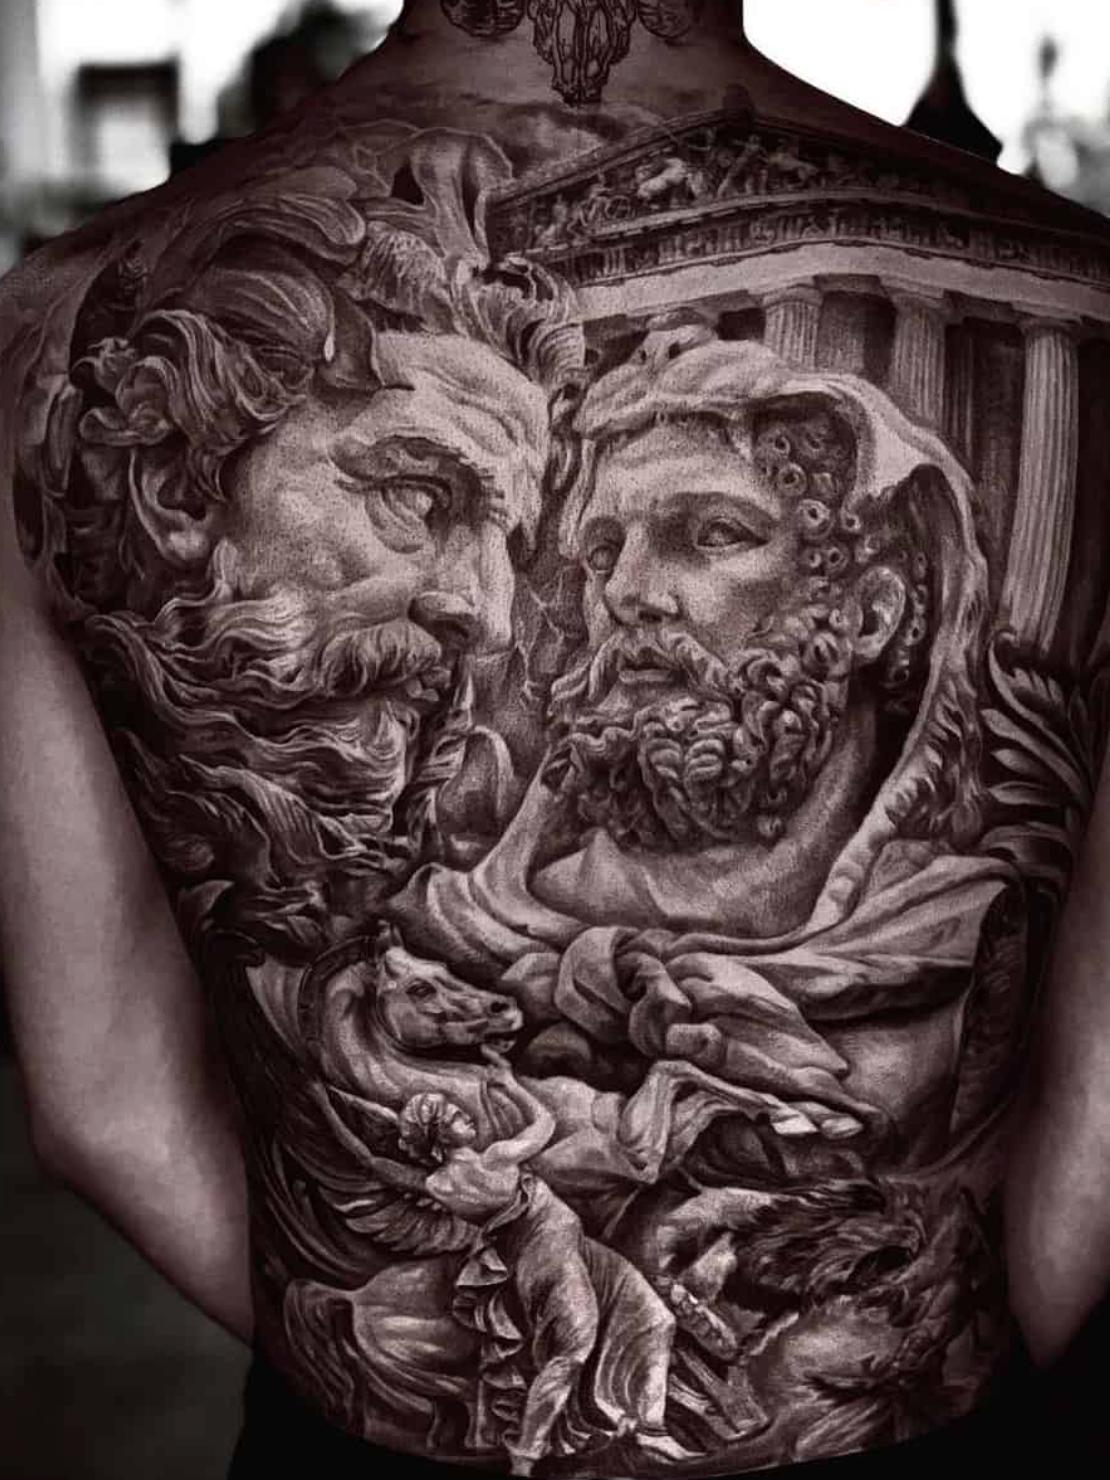 Legends and Stories of Greeks Gods